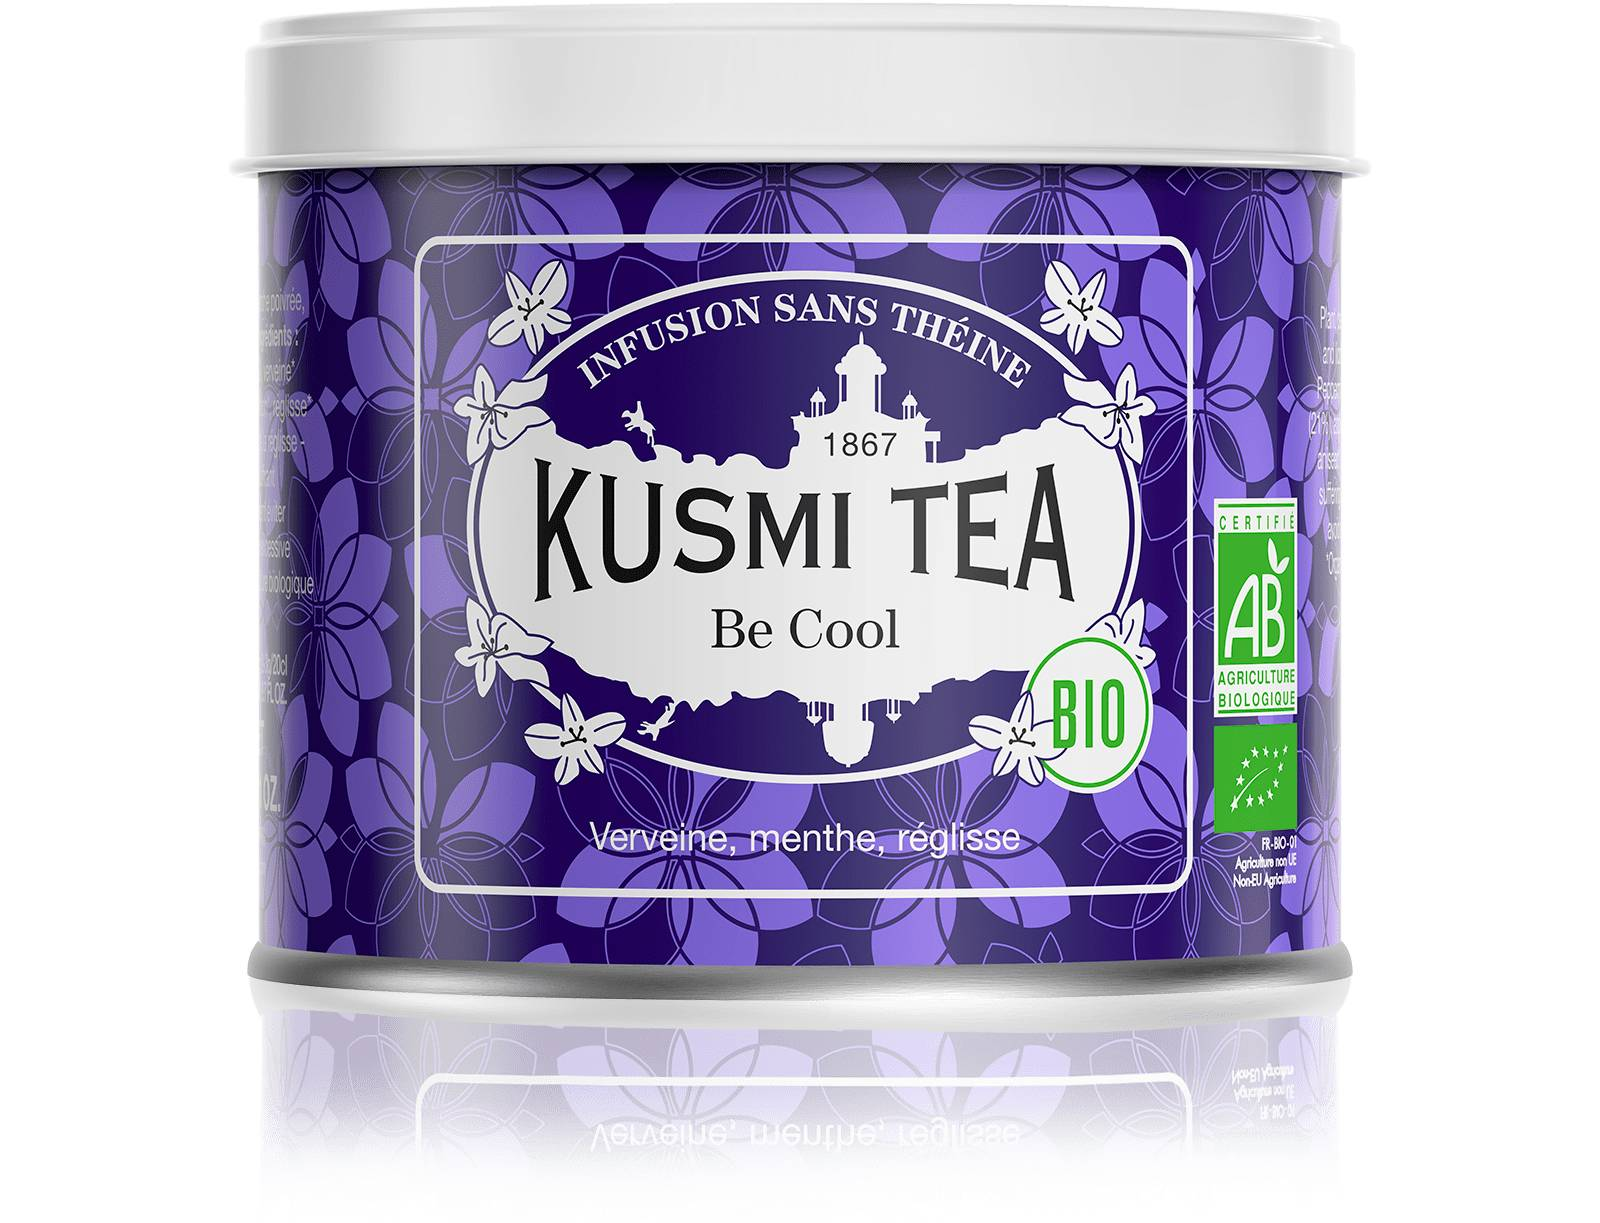 KUSMI TEA Be Cool bio Kusmi Tea